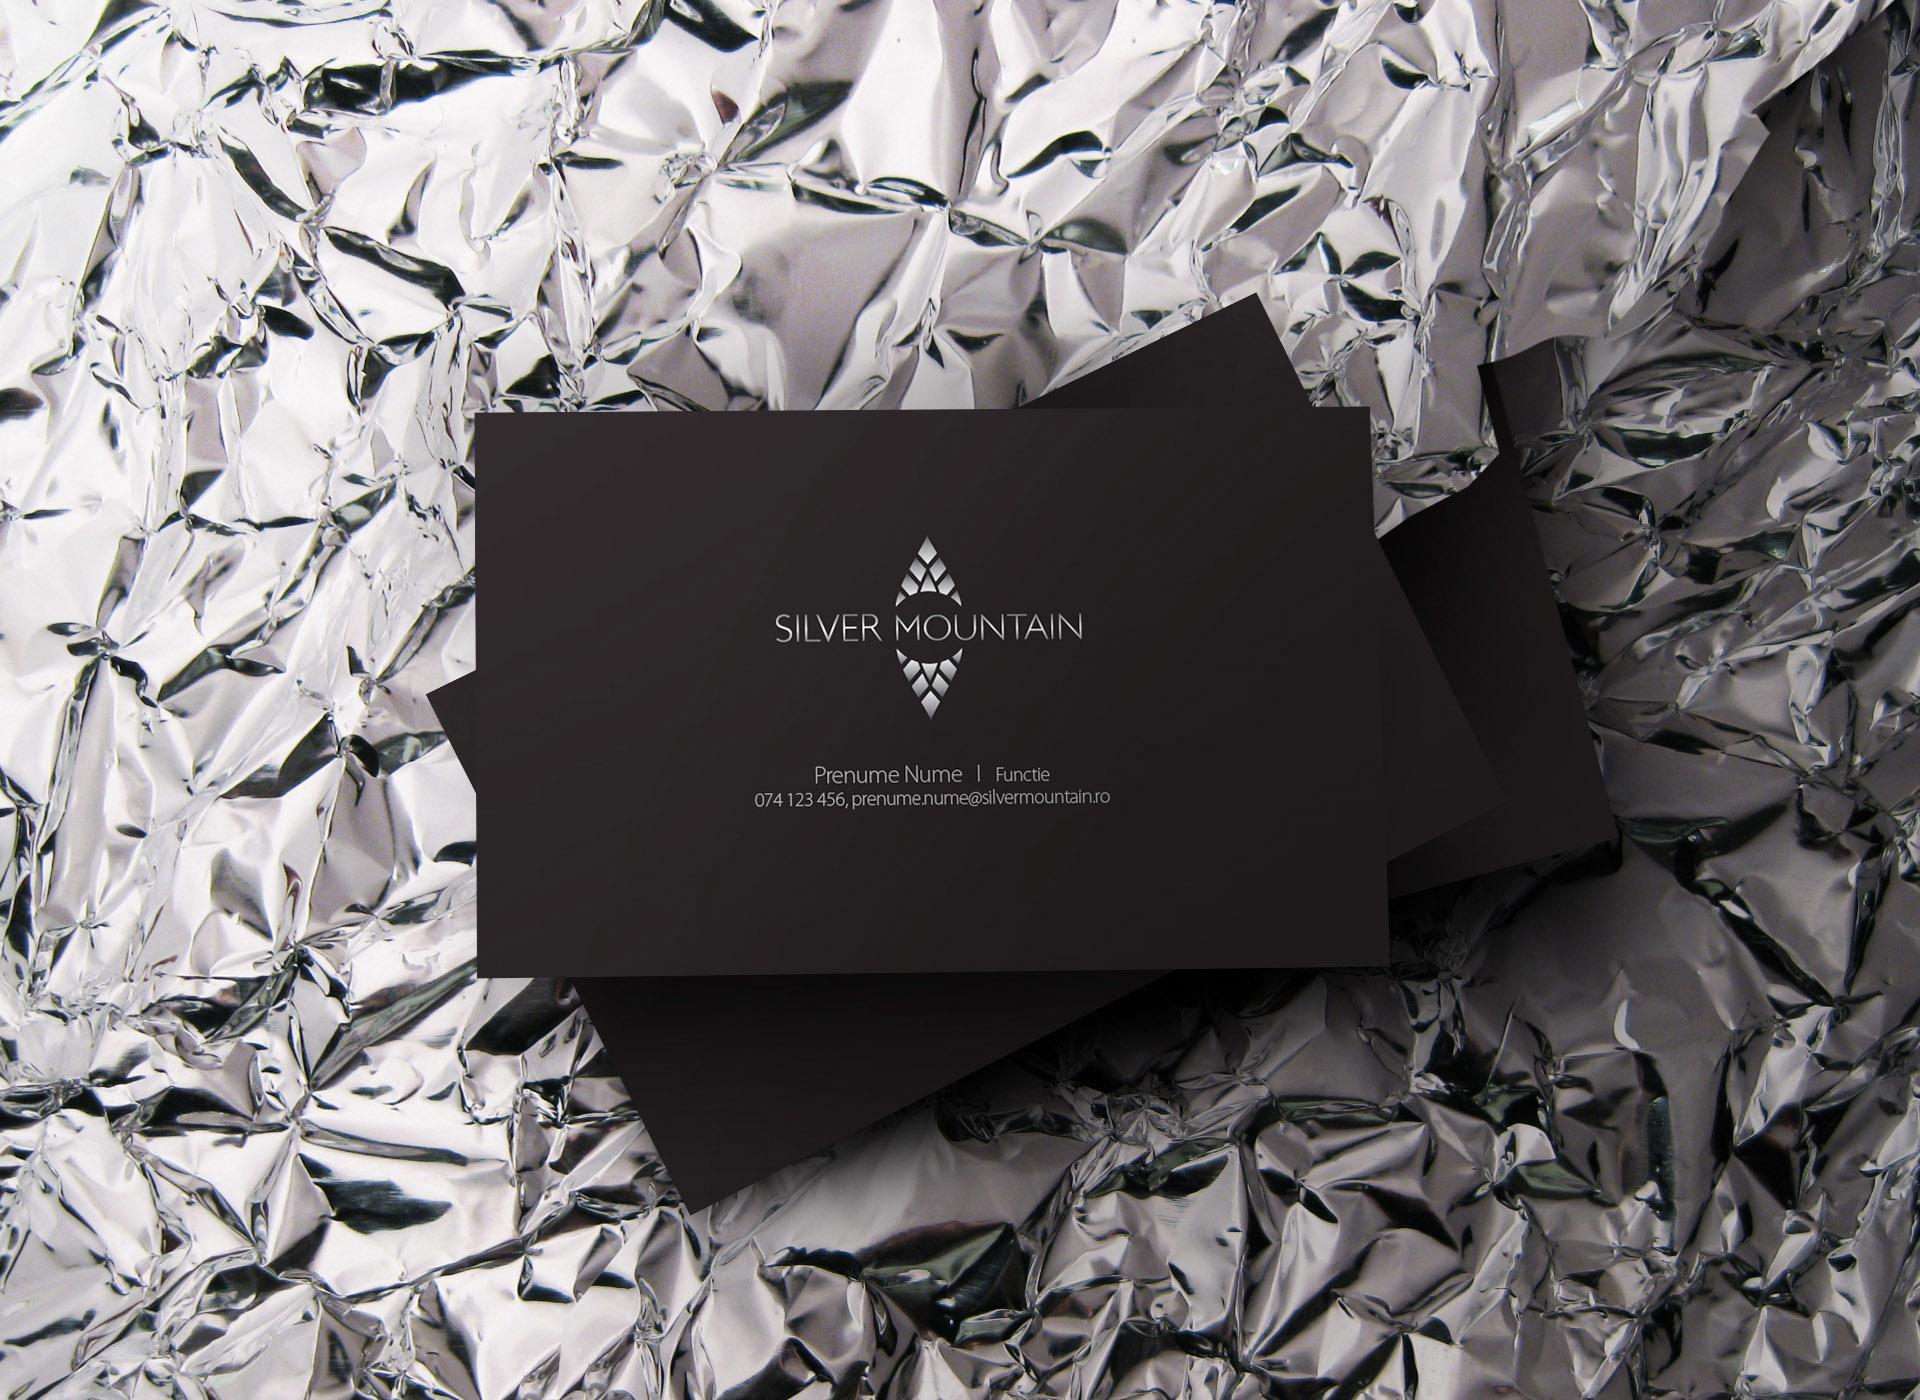 Silver Mountain portfolio inoveo business card